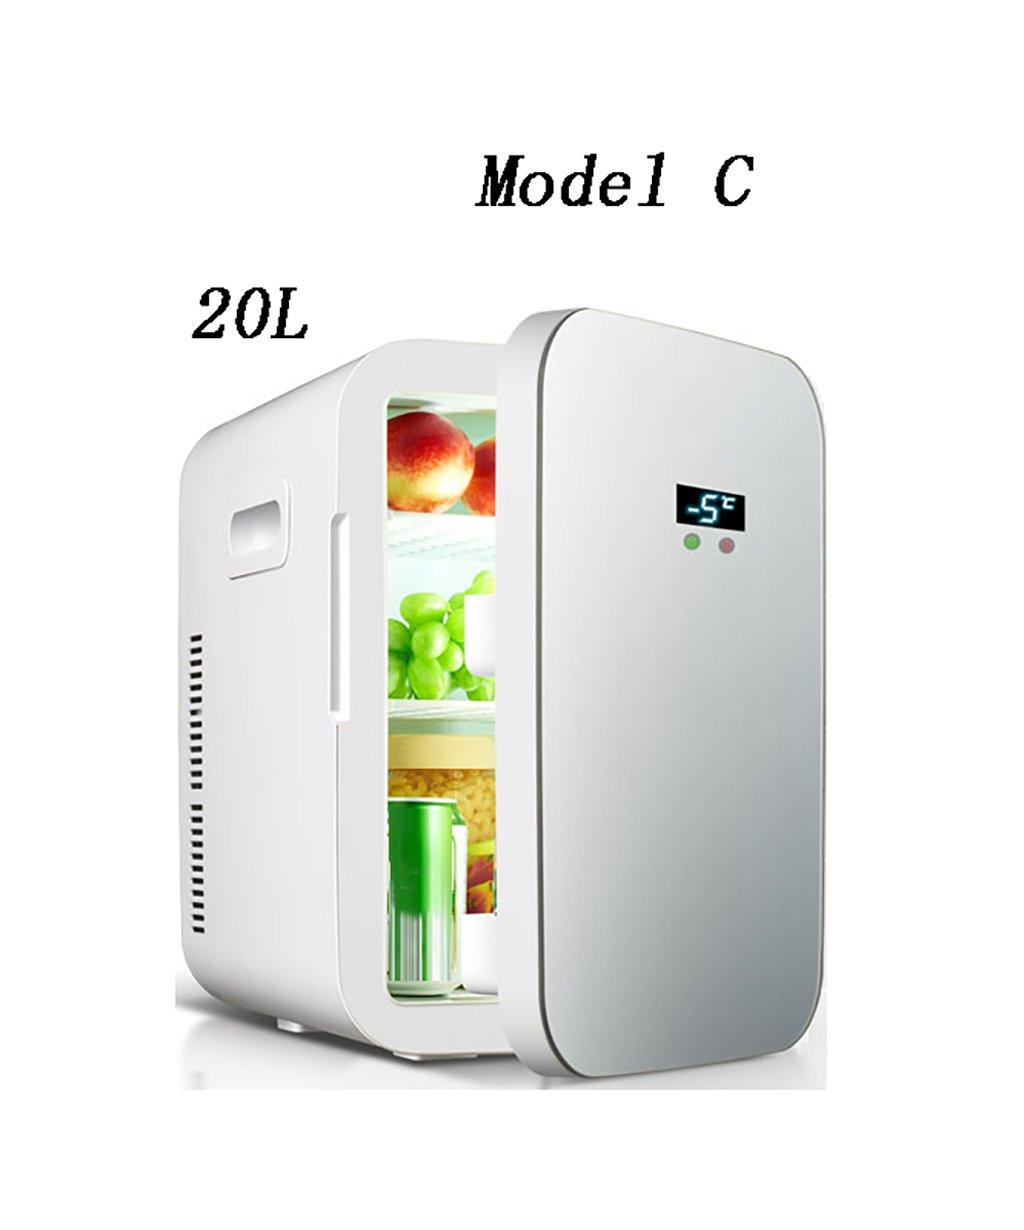 LIQICAI Elektrische Kühlbox Kühlung Auto Mini Kühlschrank Elektrische Kühlbox Kühler Warm/Cool Temperatur Einstellbar -12V DC 220V AC (Farbe : grau, größe : Model-C)